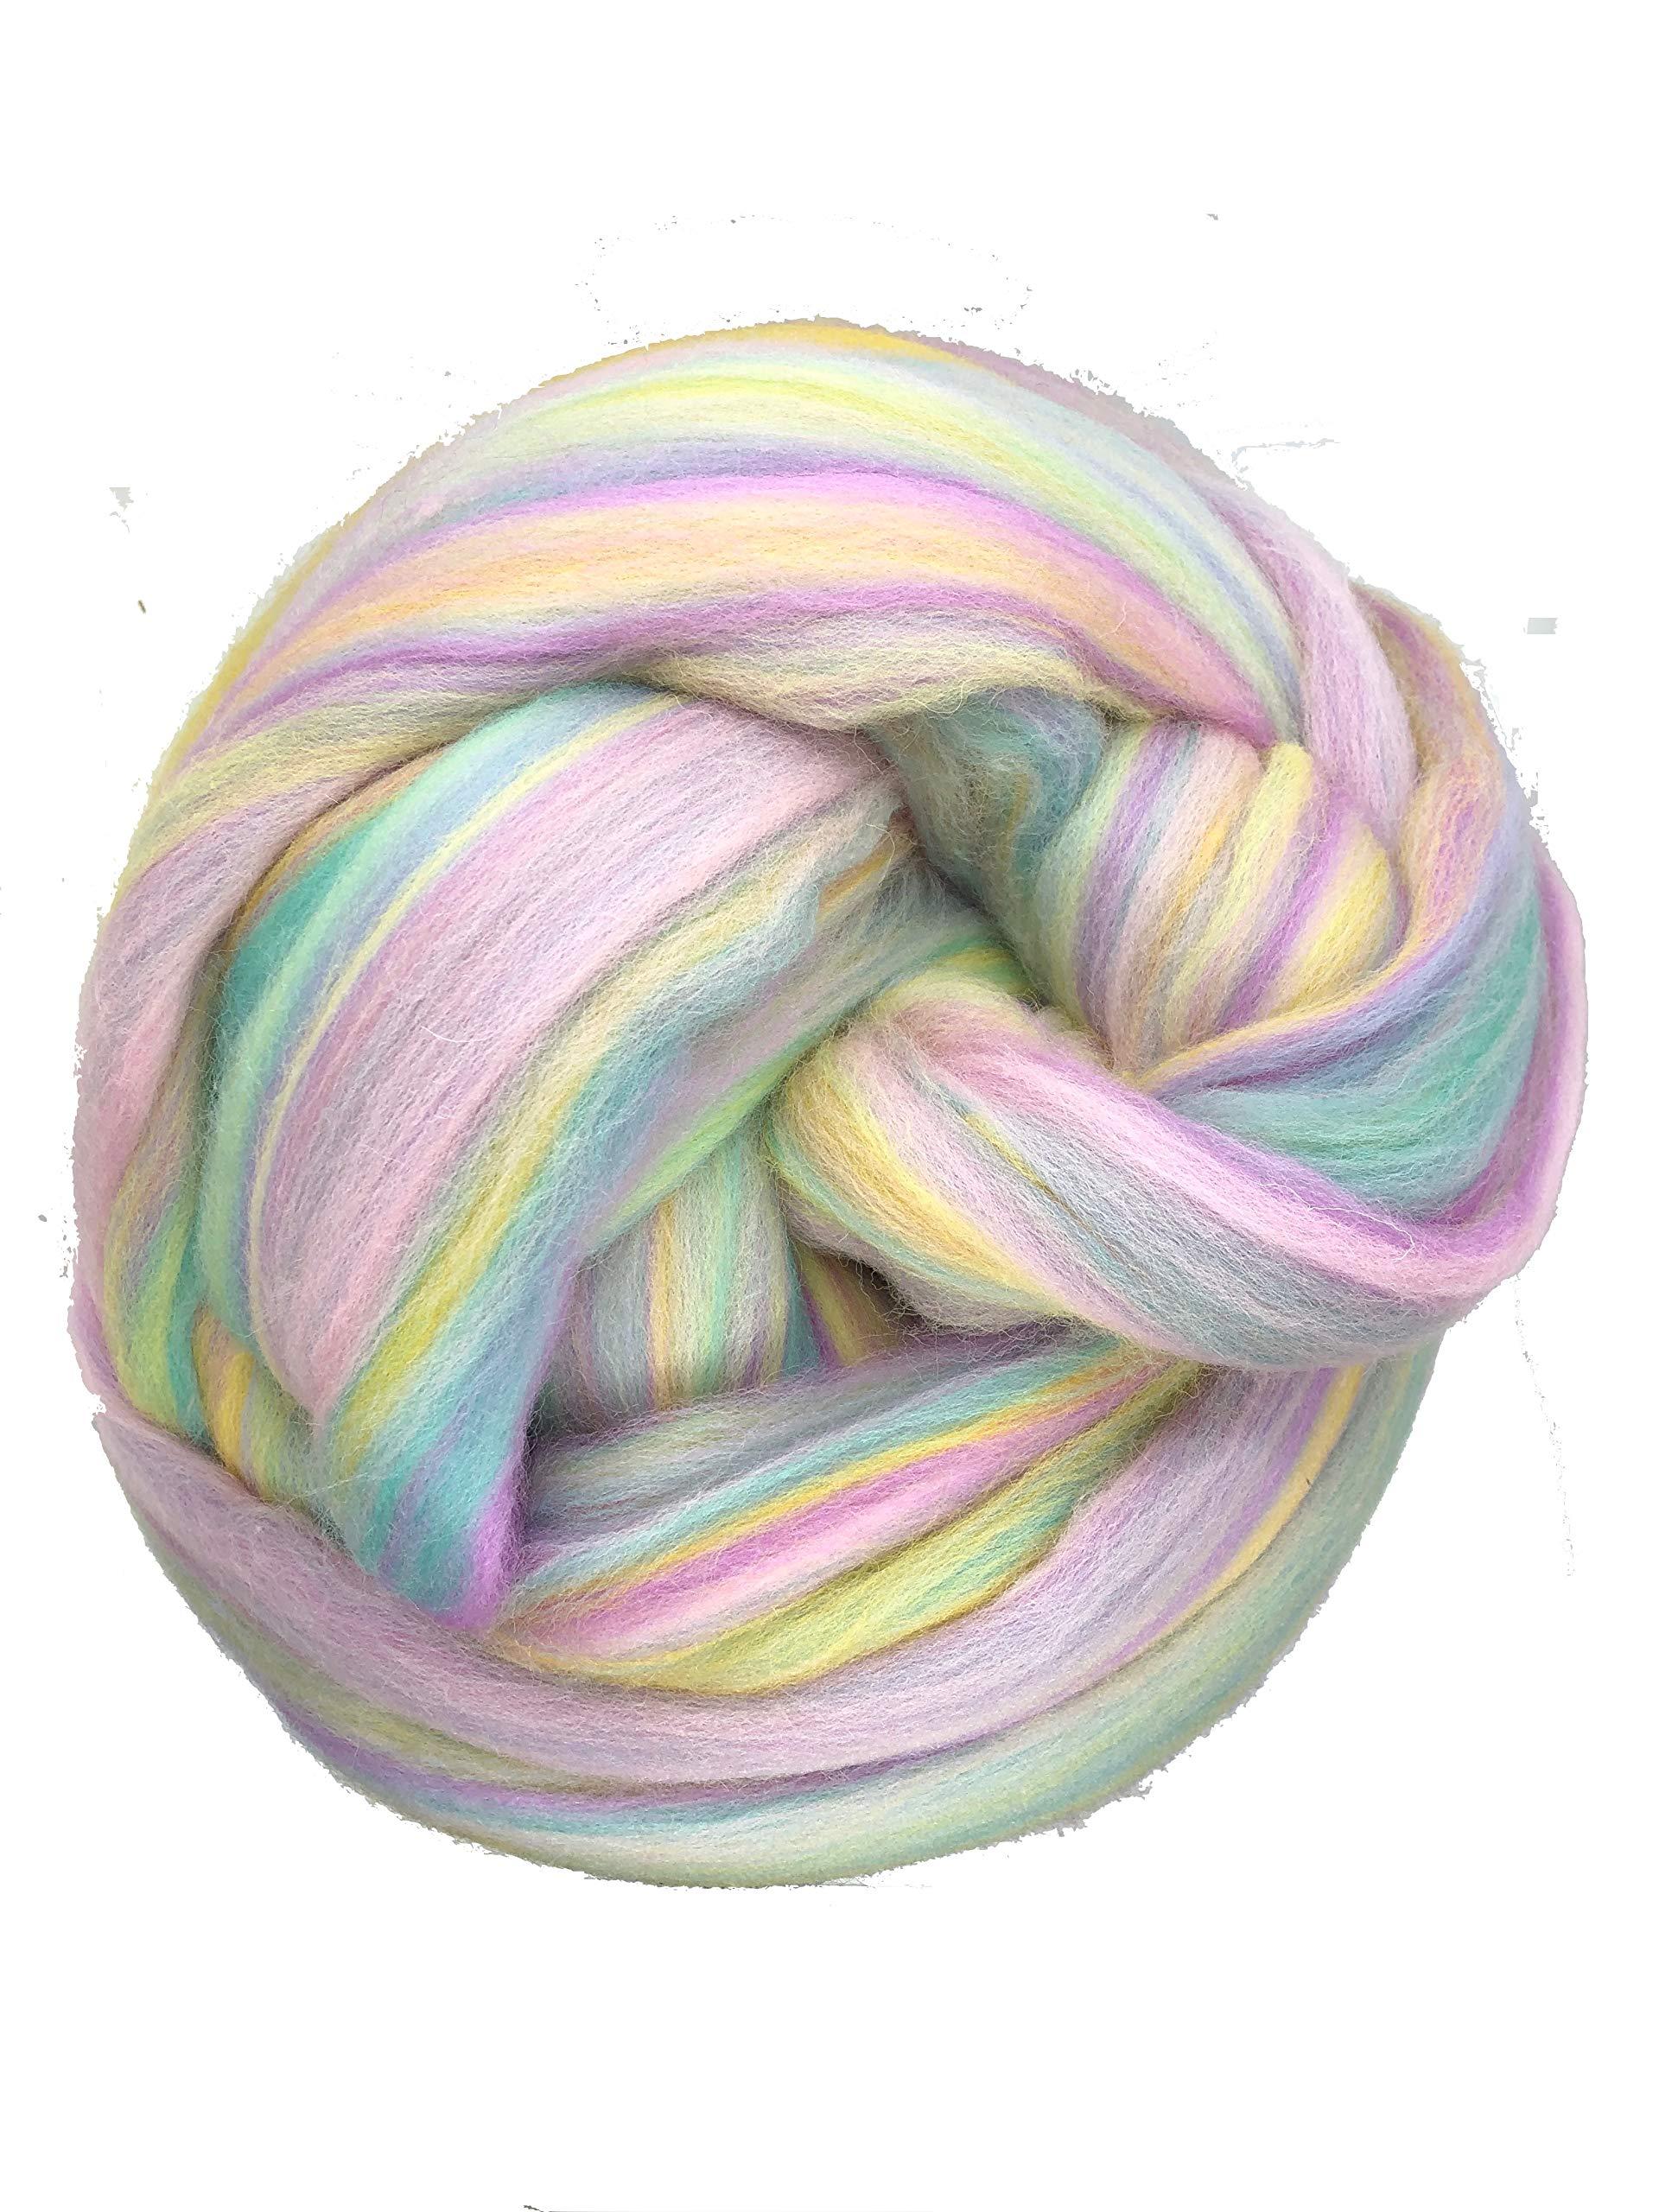 Shep's Pastel Rainbow Merino Wool Top Roving Spinning, Felting Crafts USA (4lb) by Shep's Wool (Image #1)